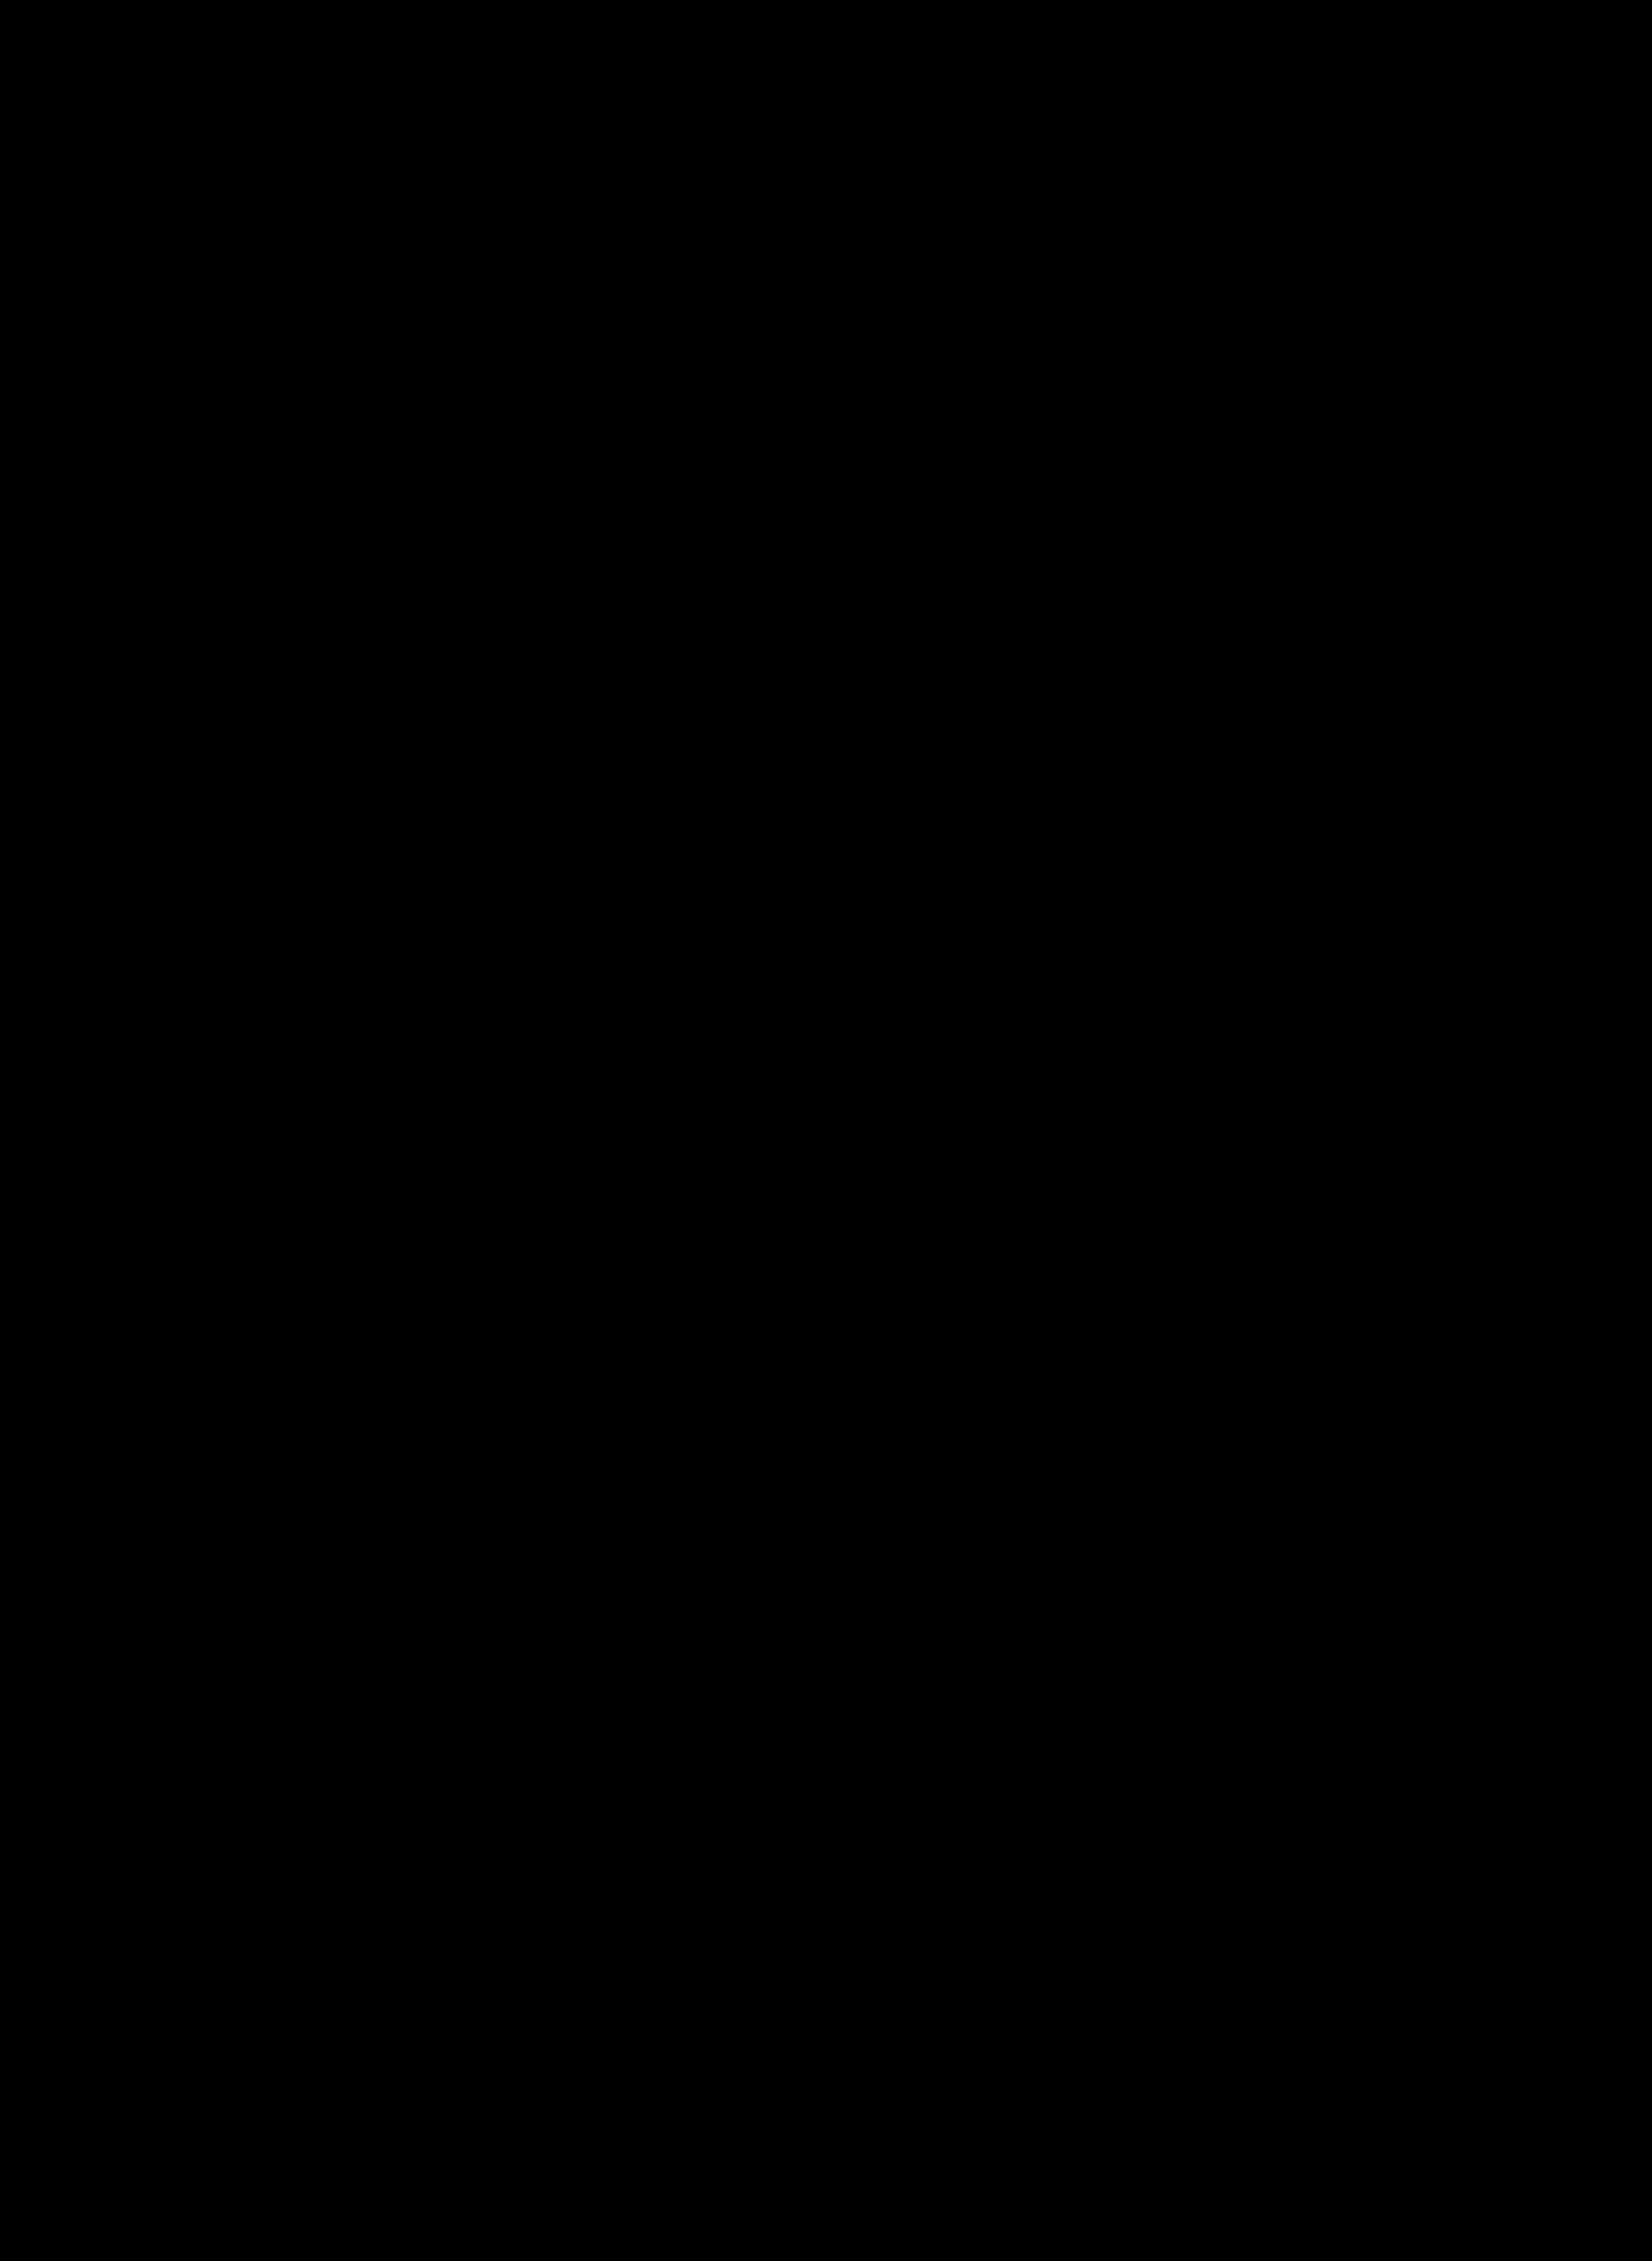 2000x2737 Fileturtle Marking.svg